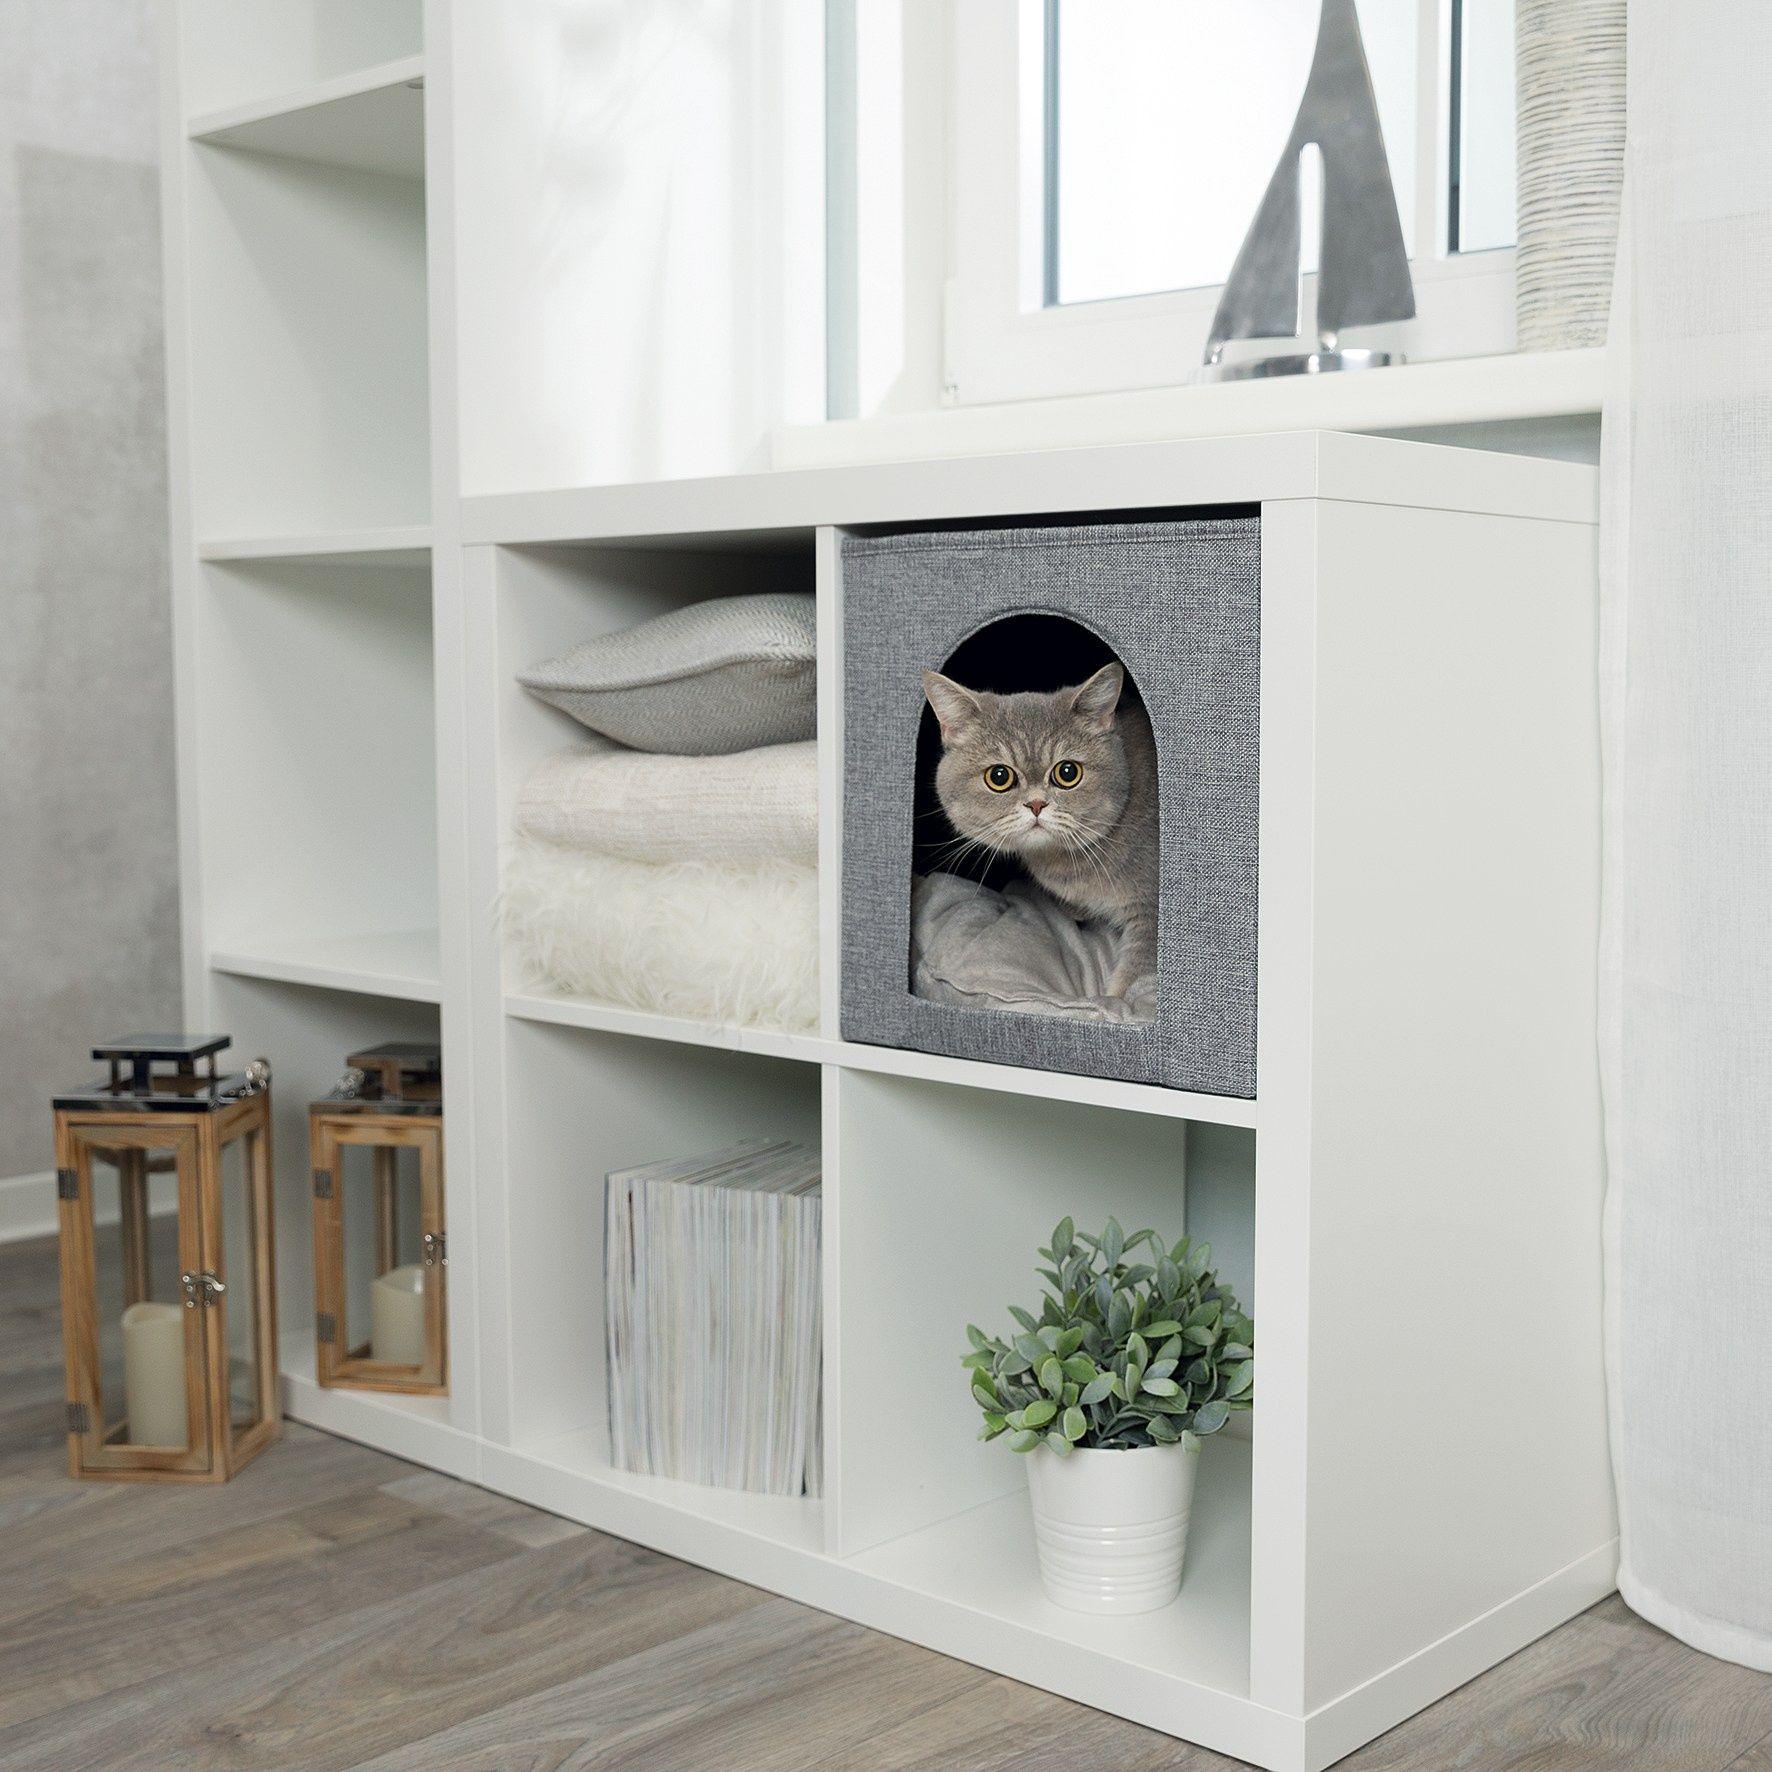 Handig Past In Kalax Expedit Ikea Kast Too Cute Cats